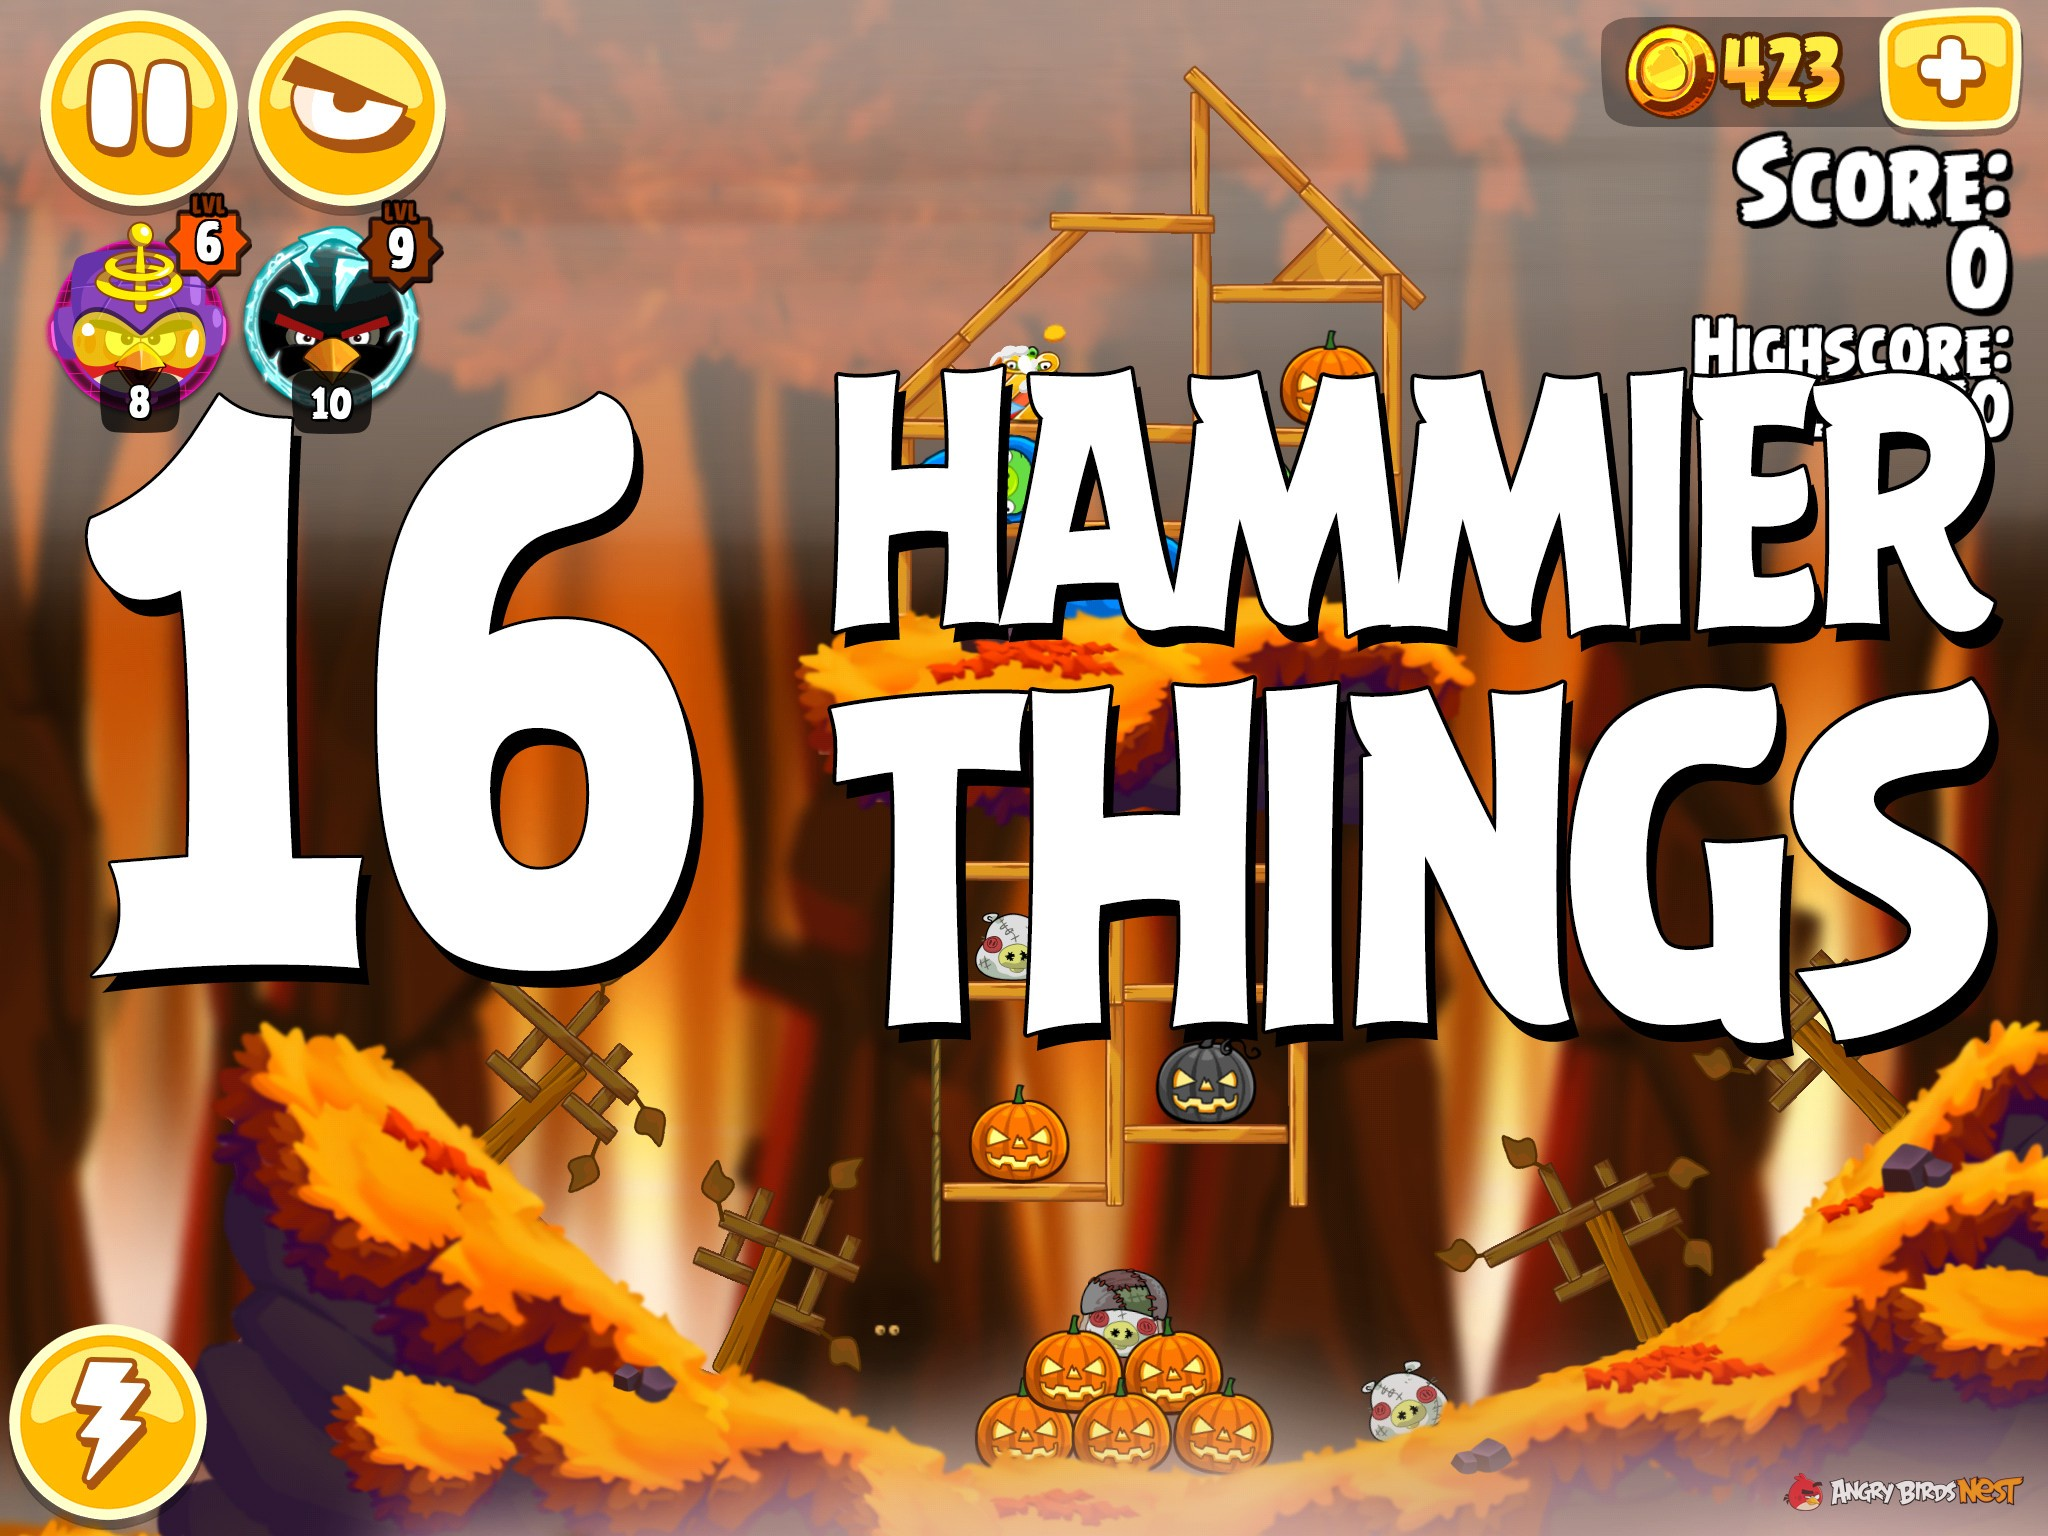 Angry Birds Hammier Things angry birds seasons hammier things level 1-16 walkthrough